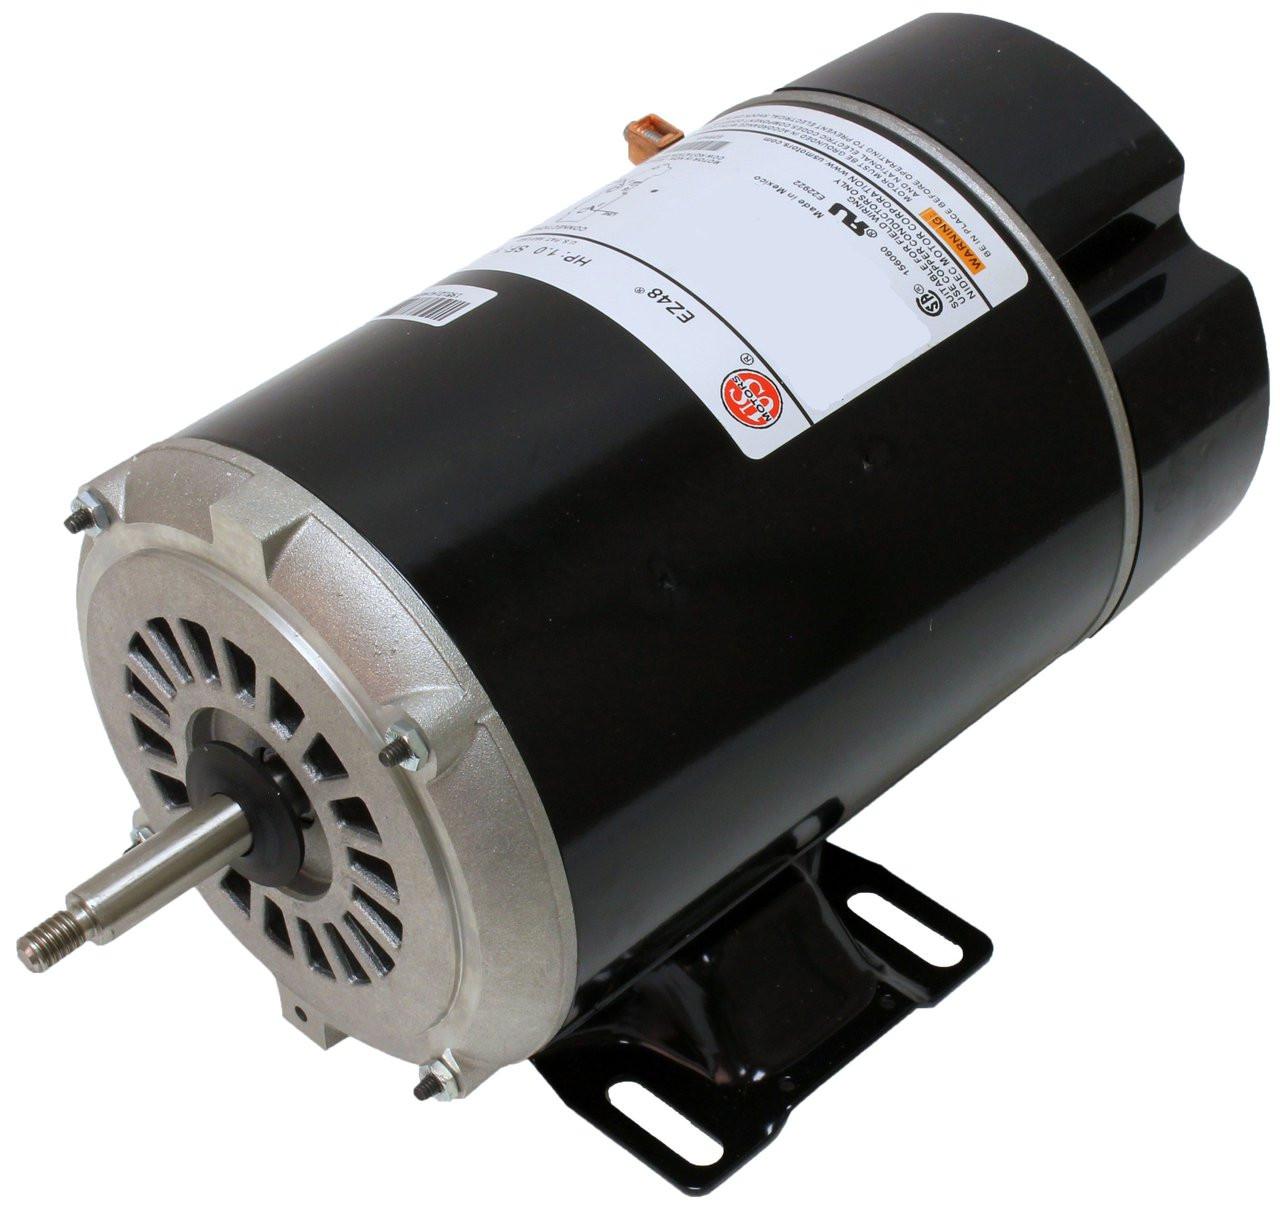 2 hp 3450/1725 RPM 48Y Frame 230V 2-Speed Pool & Spa Electric Motor ...